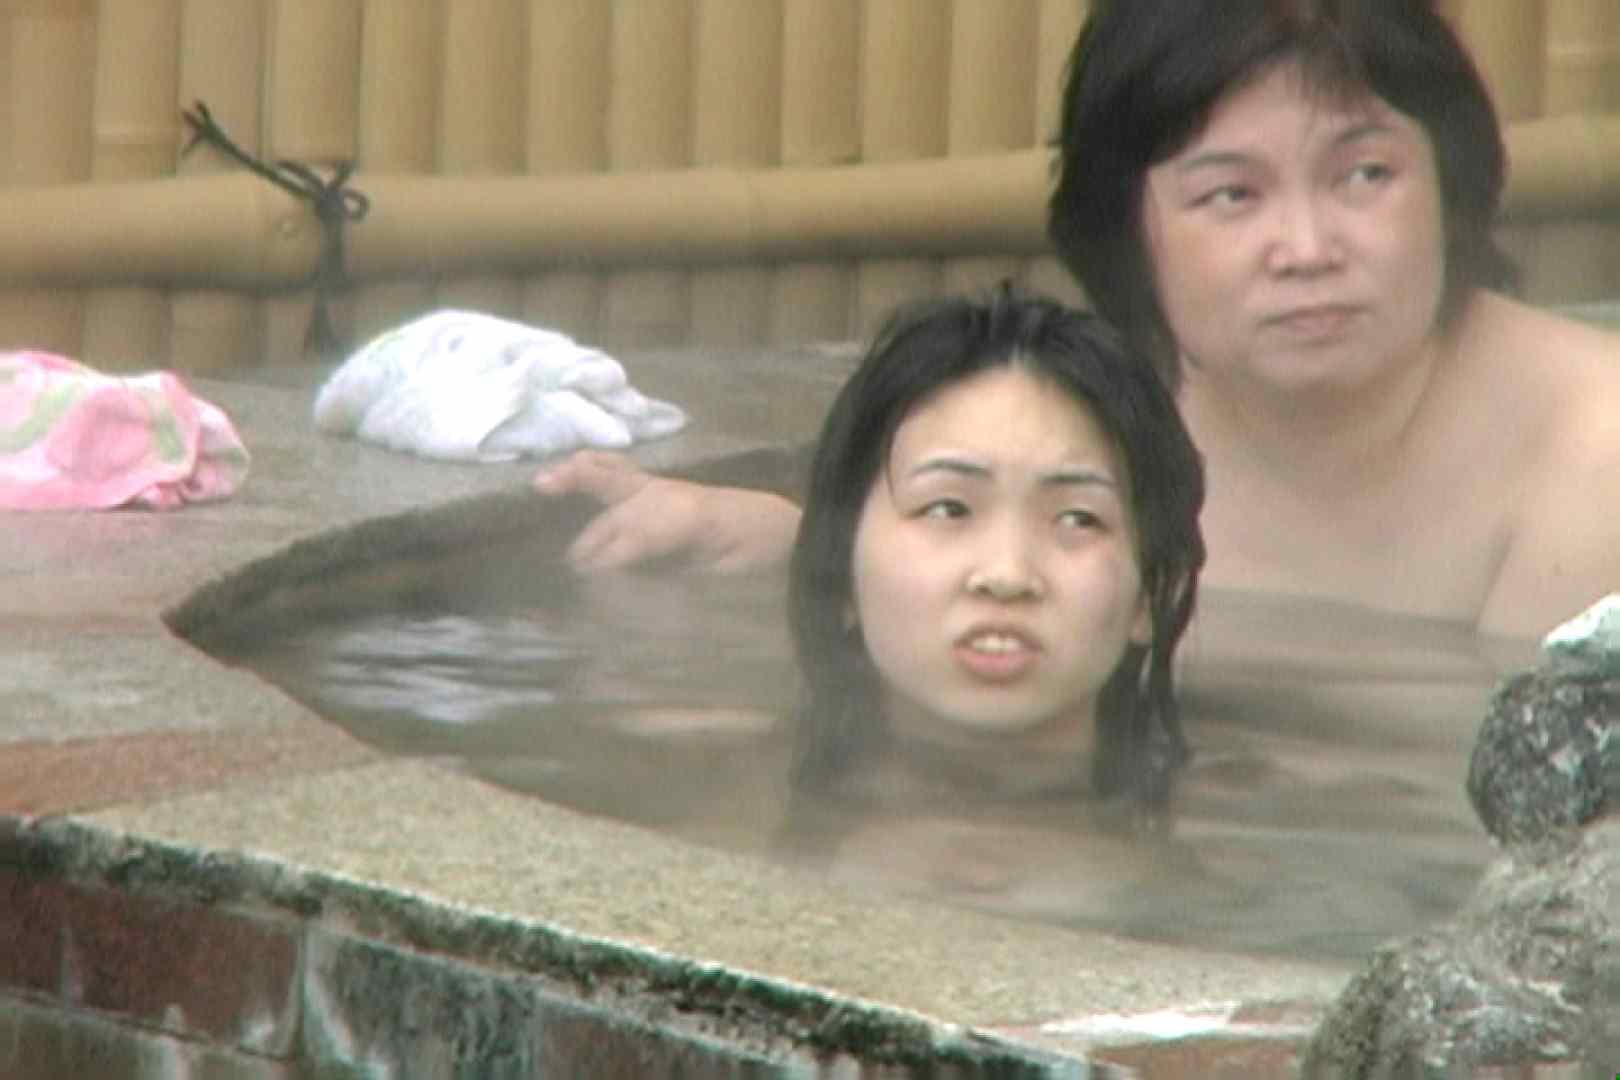 Aquaな露天風呂Vol.646 HなOL | 盗撮  89pic 38